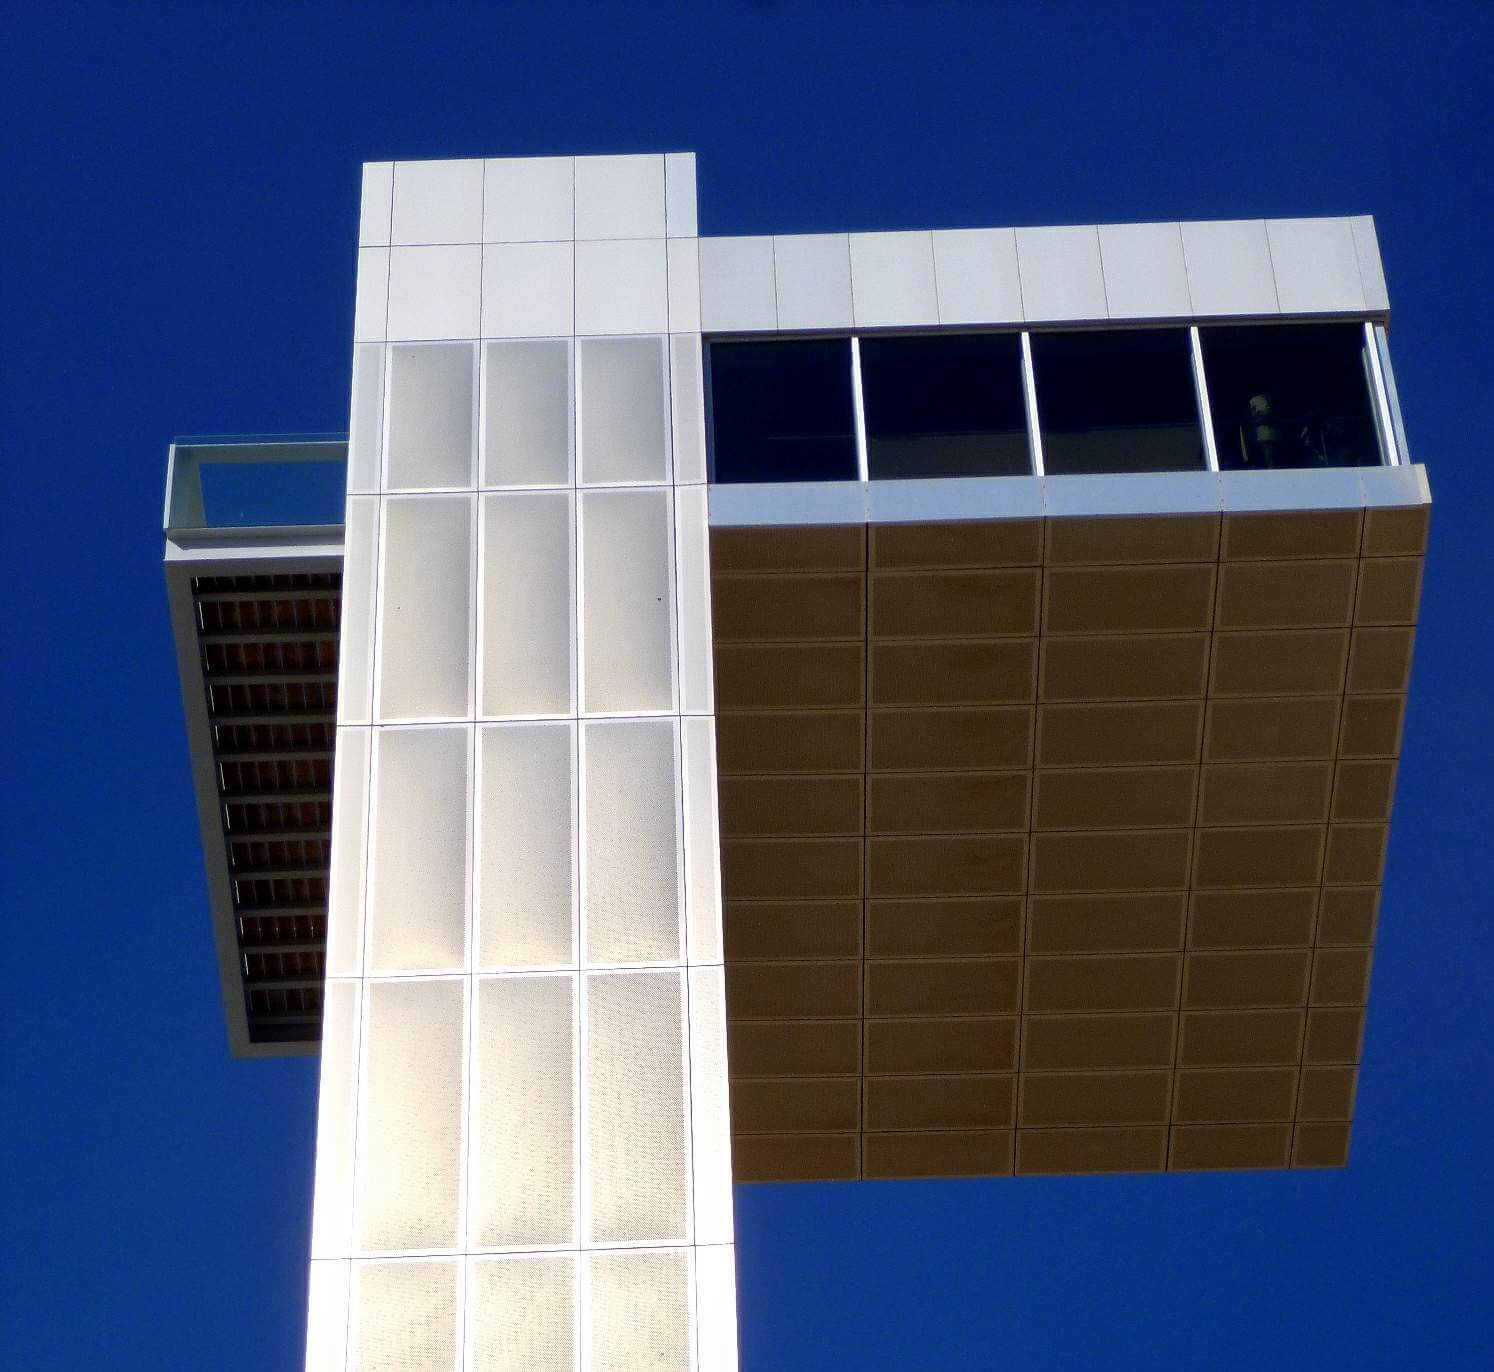 Plataforma superior de la torre